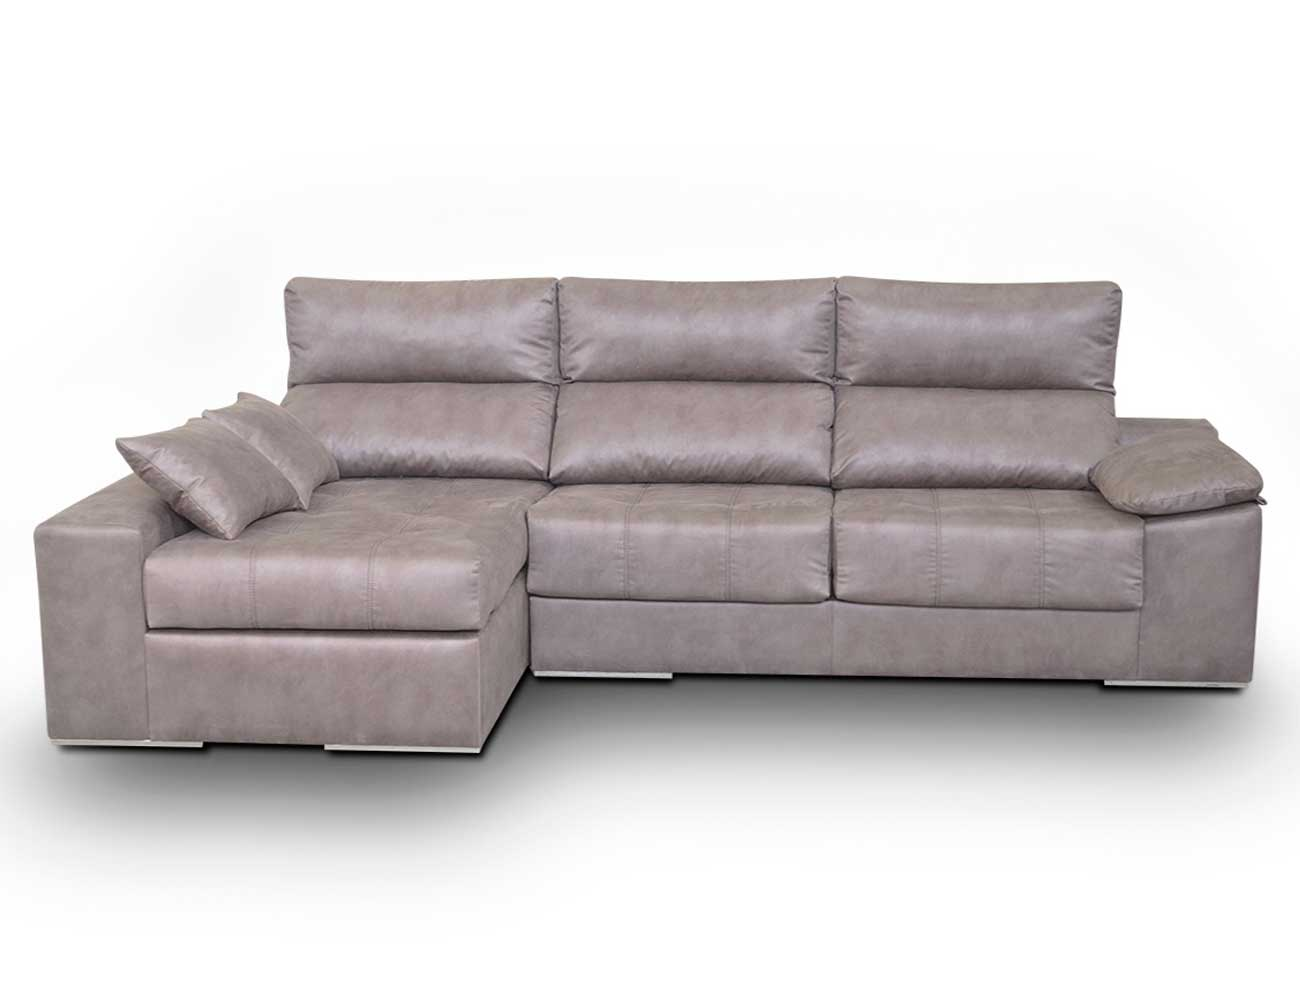 4938_sofa chaiselongue moderno asientos extraibles muy comodo dobles pespuntes donatella1